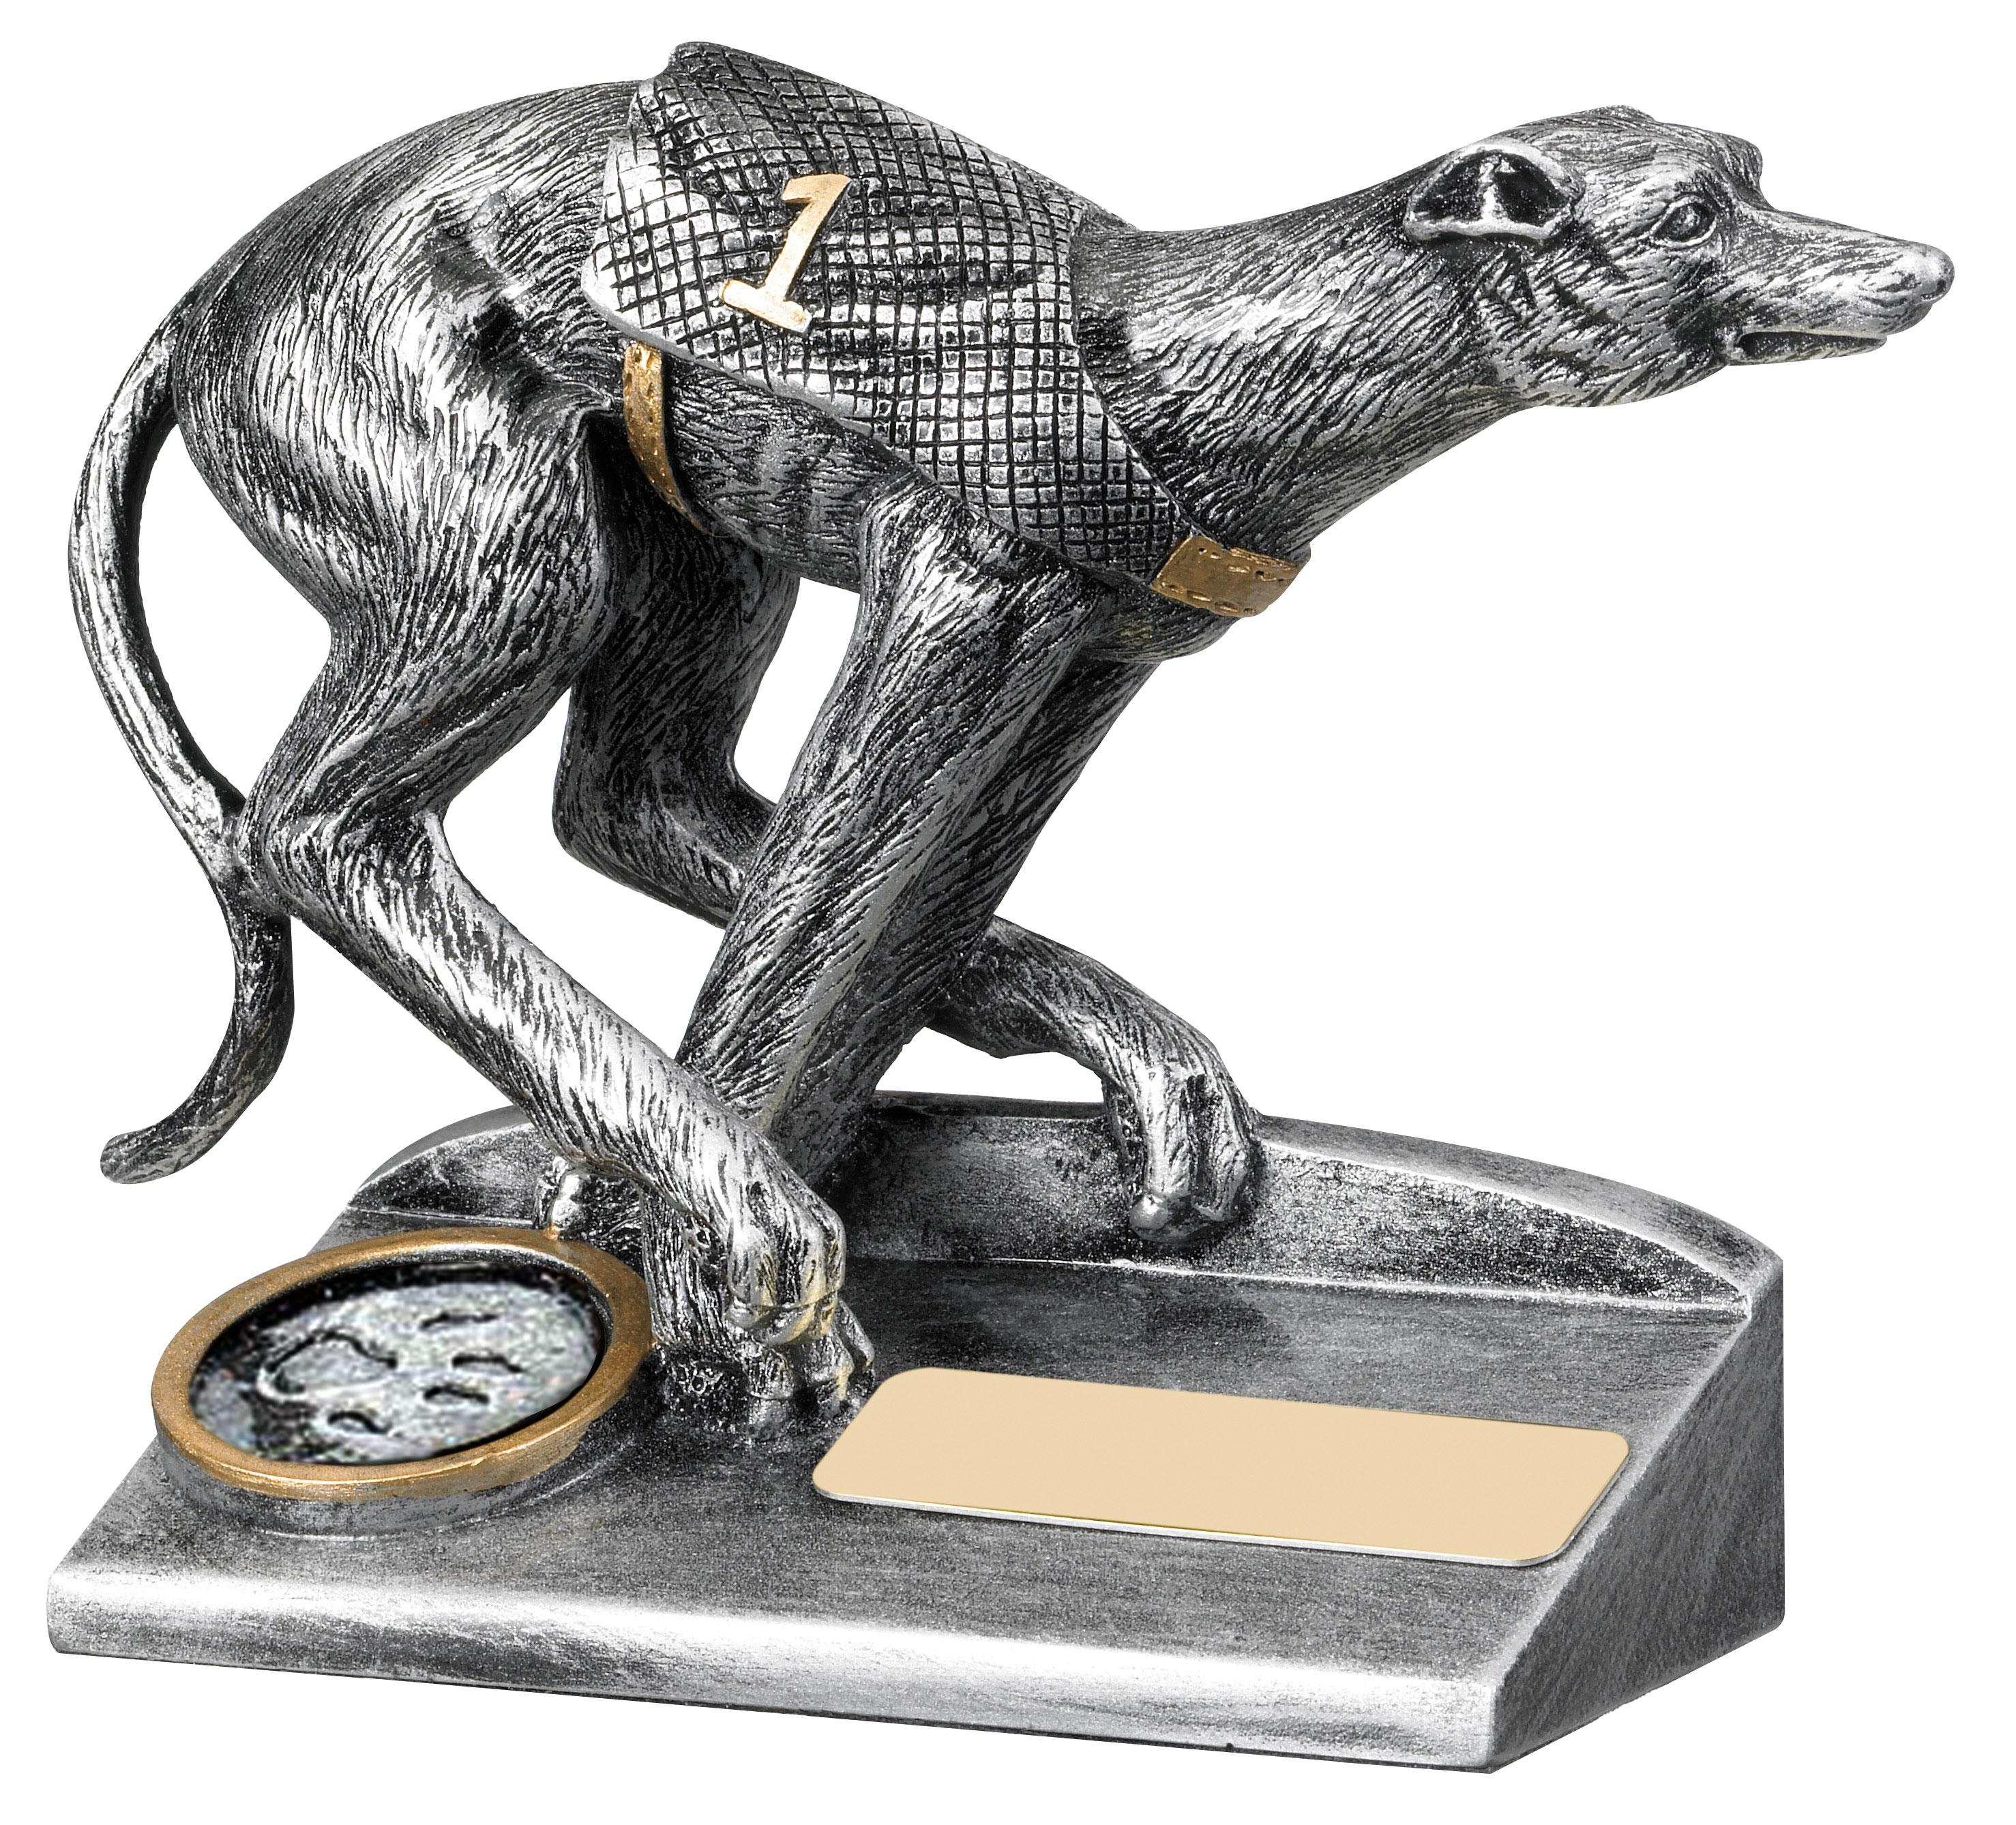 "Antique Silver Greyhound Racing Trophy 10cm (4"")"